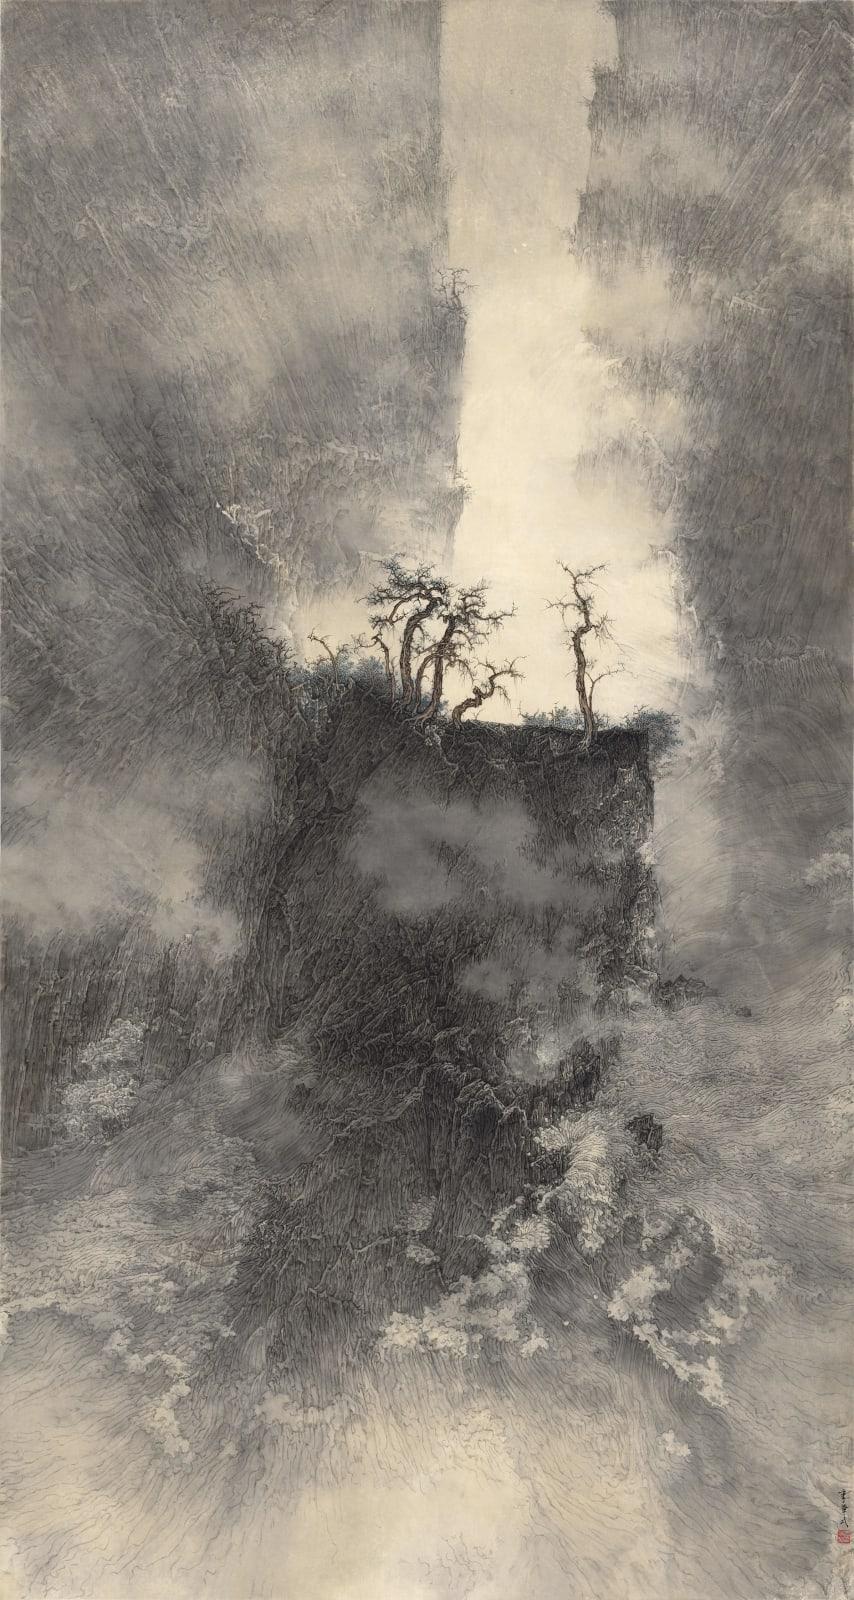 Li Huayi 李華弌, The Combat of Water and Stone《水石相搏》, 2012-2013